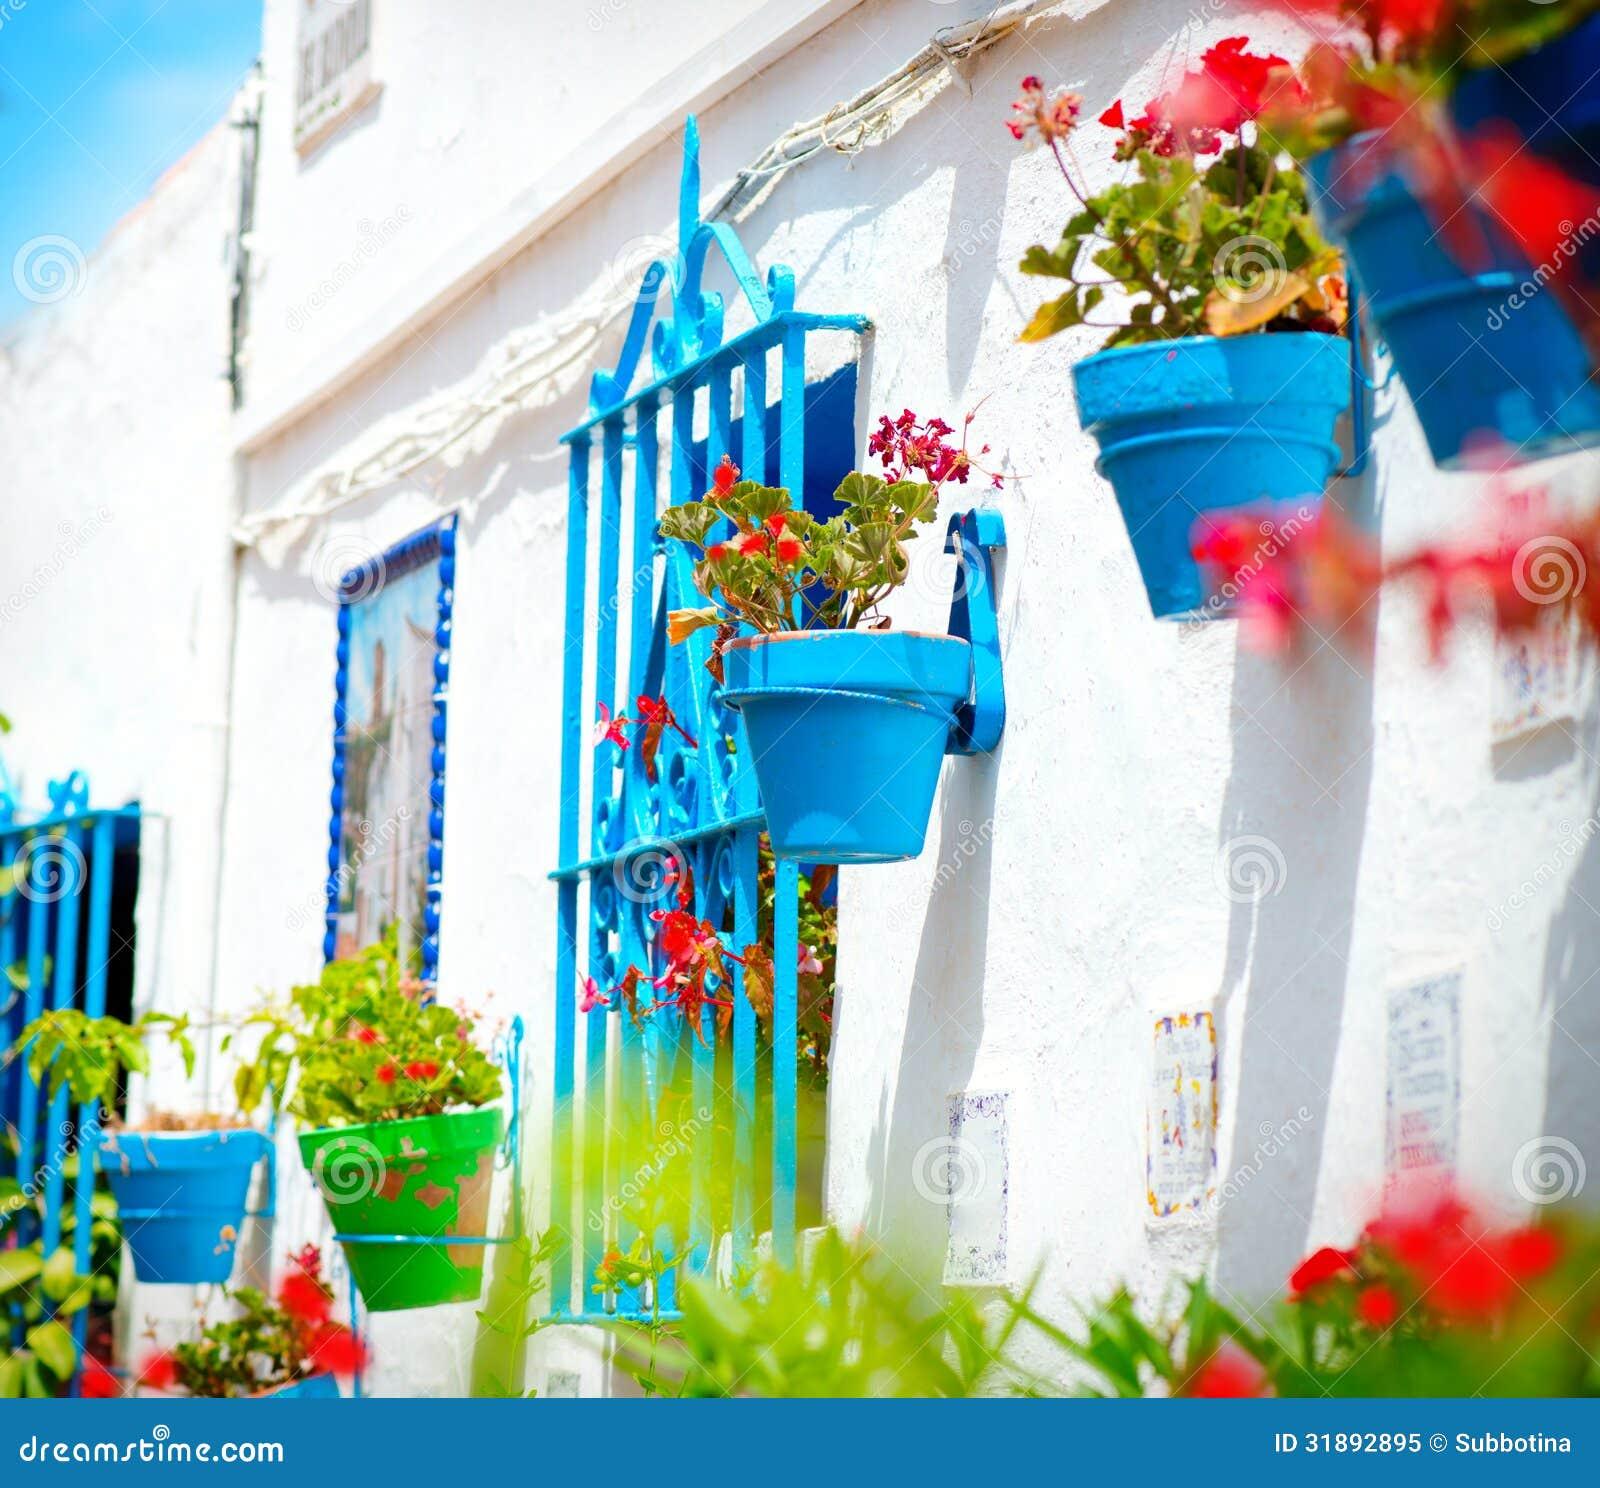 Torremolinos villaggio bianco spagnolo fotografia stock - Finestra in spagnolo ...